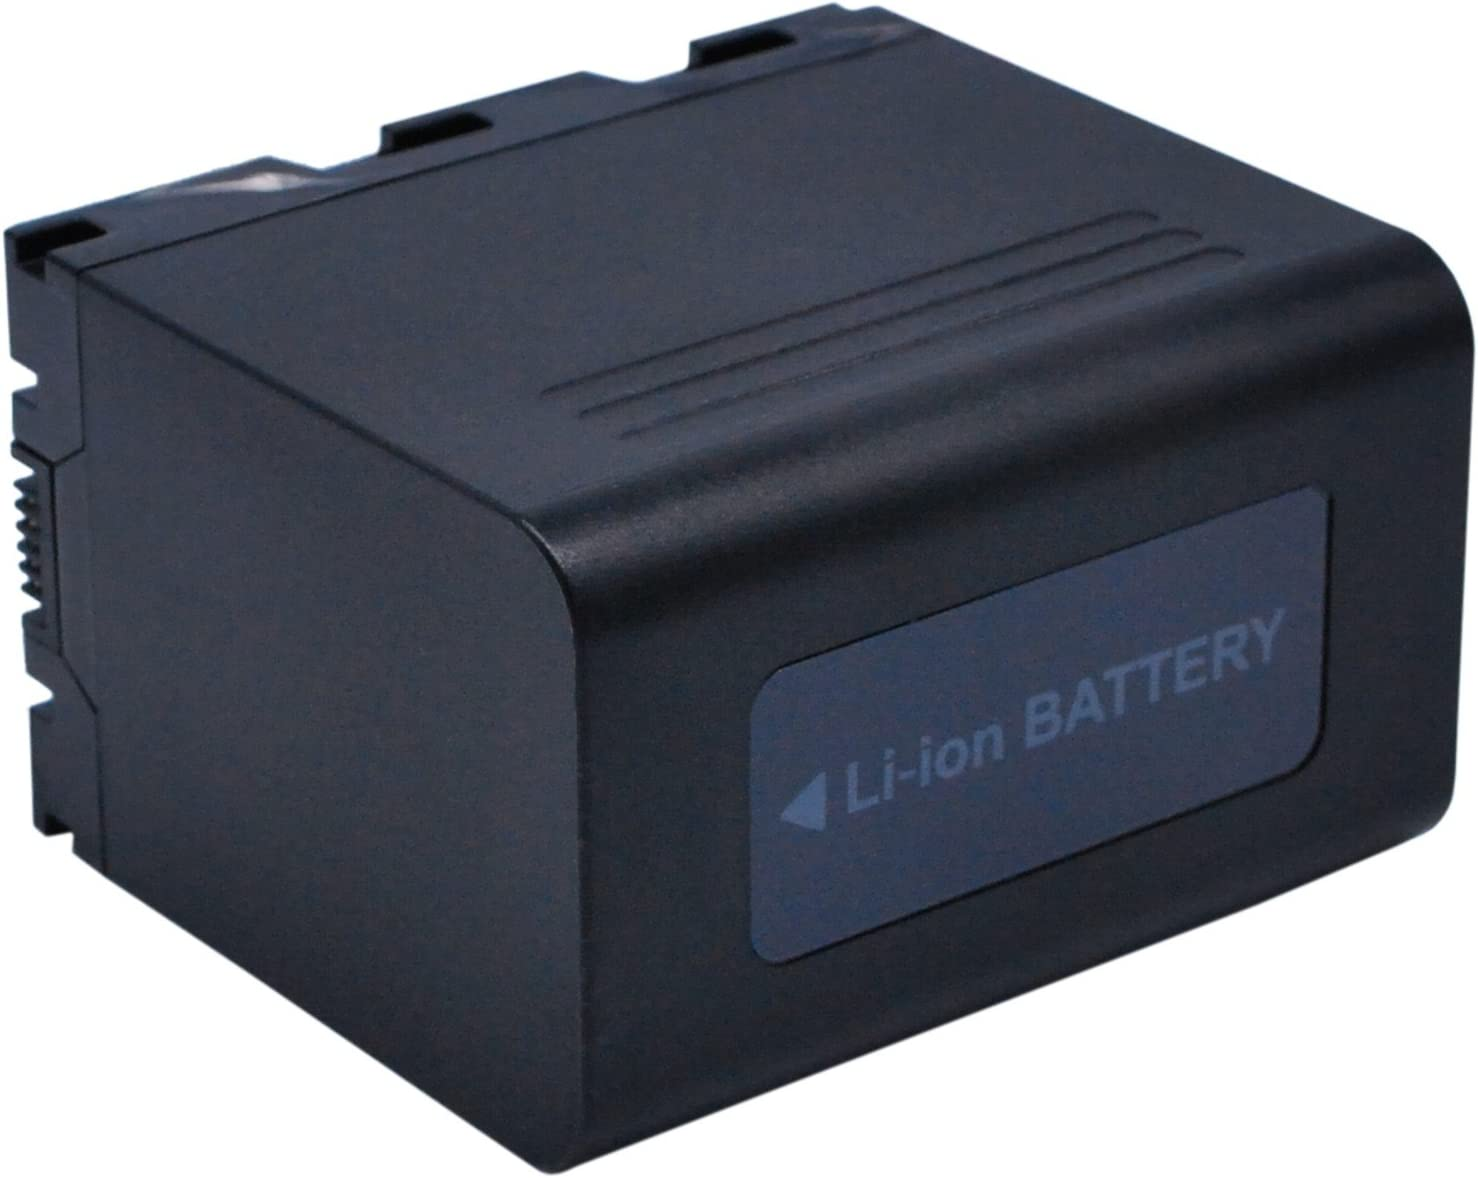 SSL-JVC70 GY-HM200ESB Battery GY-HM200E 4400mAh Replacement for JVC GY-HM200 P//N SSL-JVC50